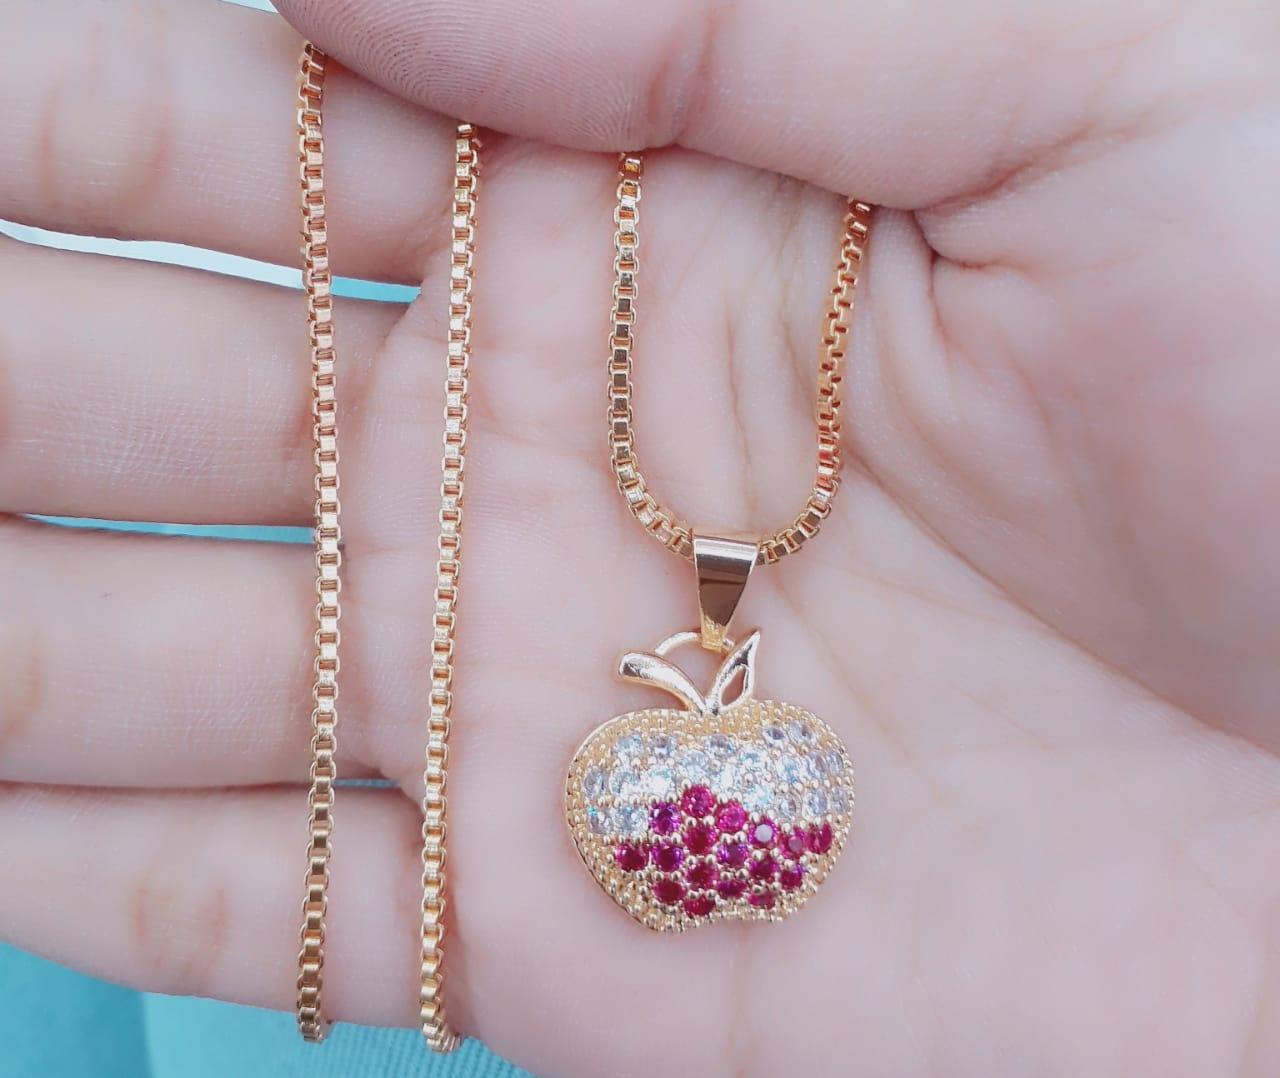 Kalung perhiasan wanita fashion xuping jewelry motip aple